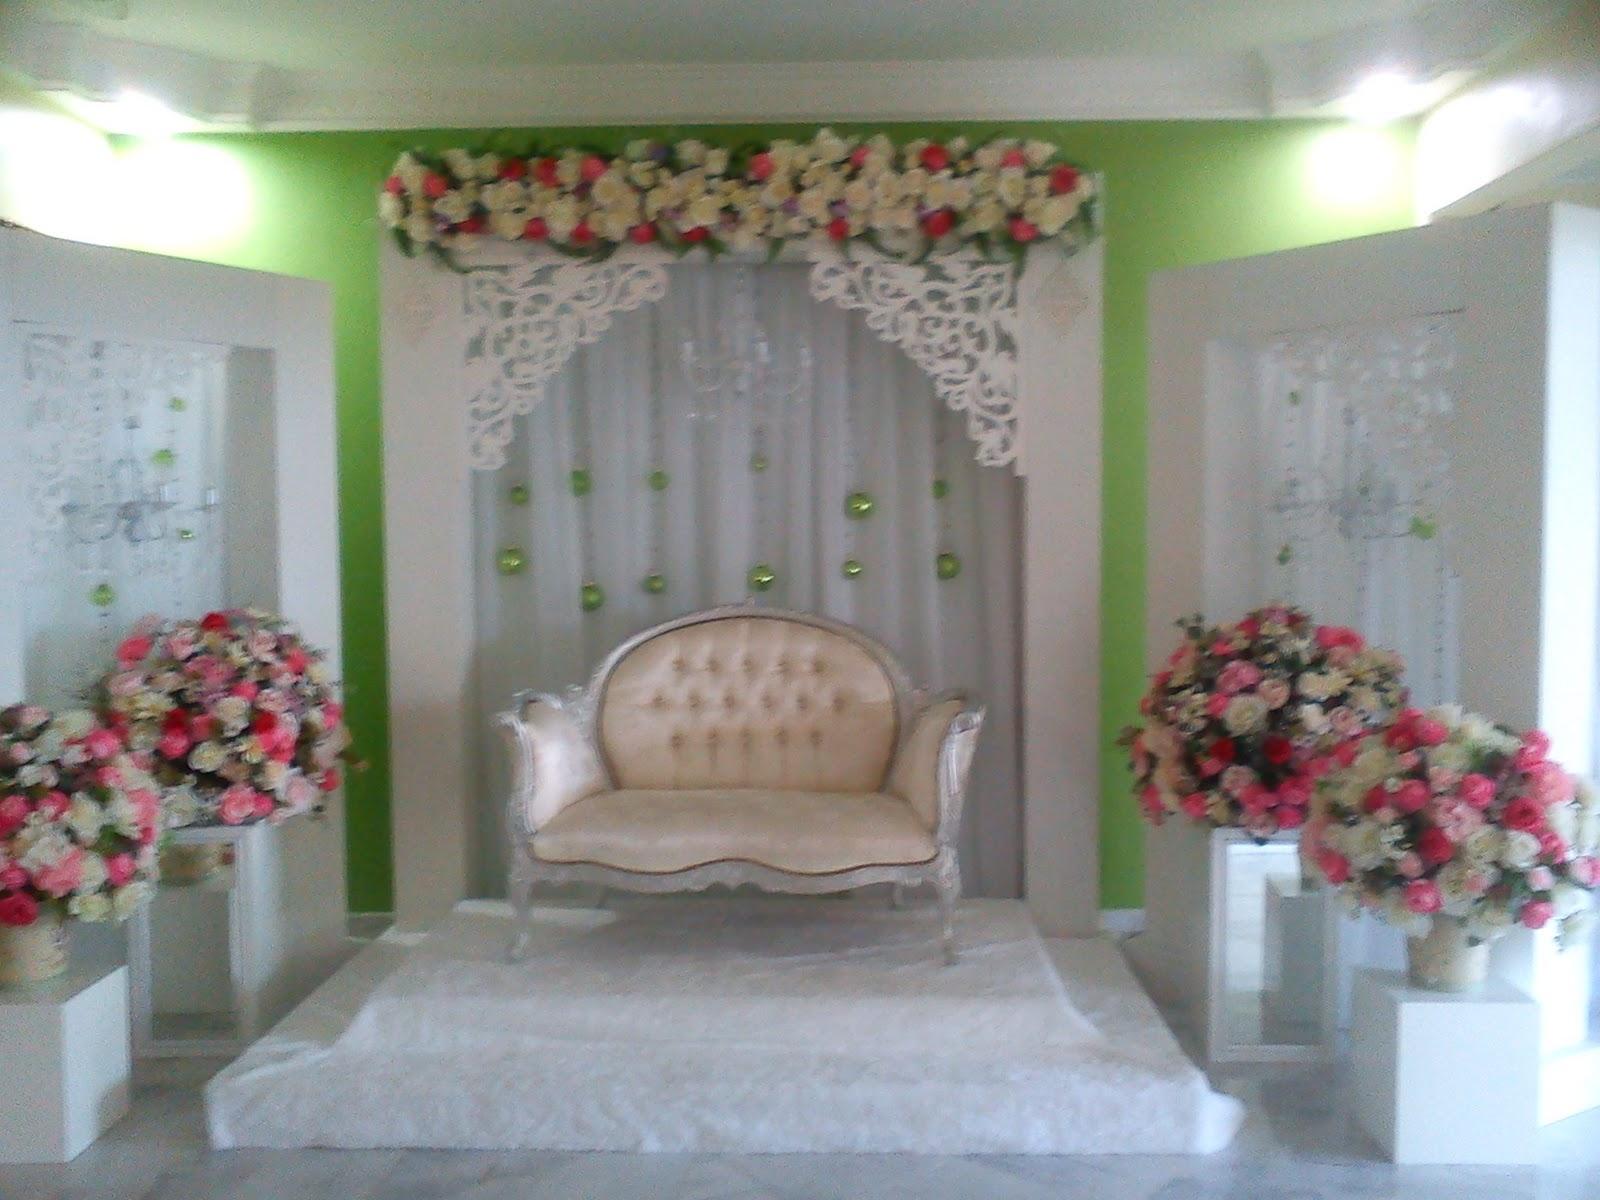 Adilkerck my sis wedding on 11122011 my sis wedding on 11122011 pelamin decoration english style junglespirit Image collections